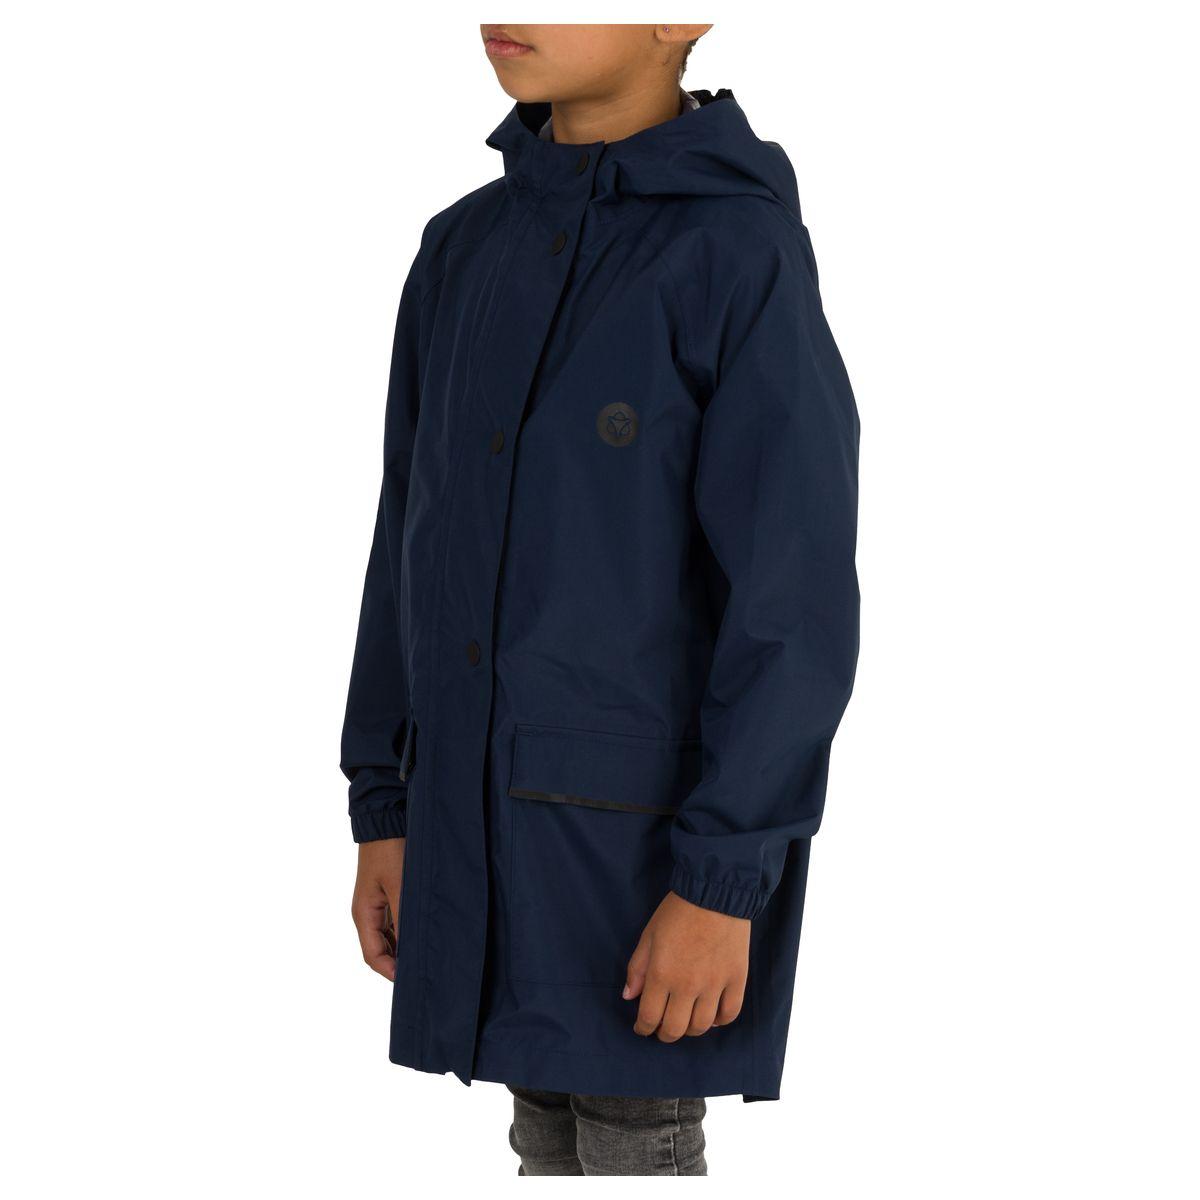 GO Parka Kids Rain Jacket Essential fit example